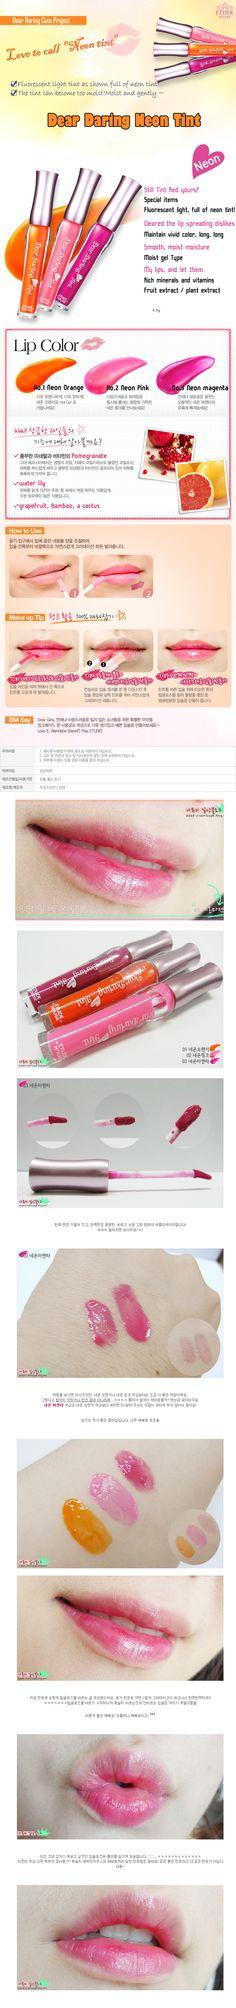 Etude House Dear Darling Tint Neon Etude House Dear Darling Neon Tint 2 Colors Product Feature To promote moist and vivid color lips.